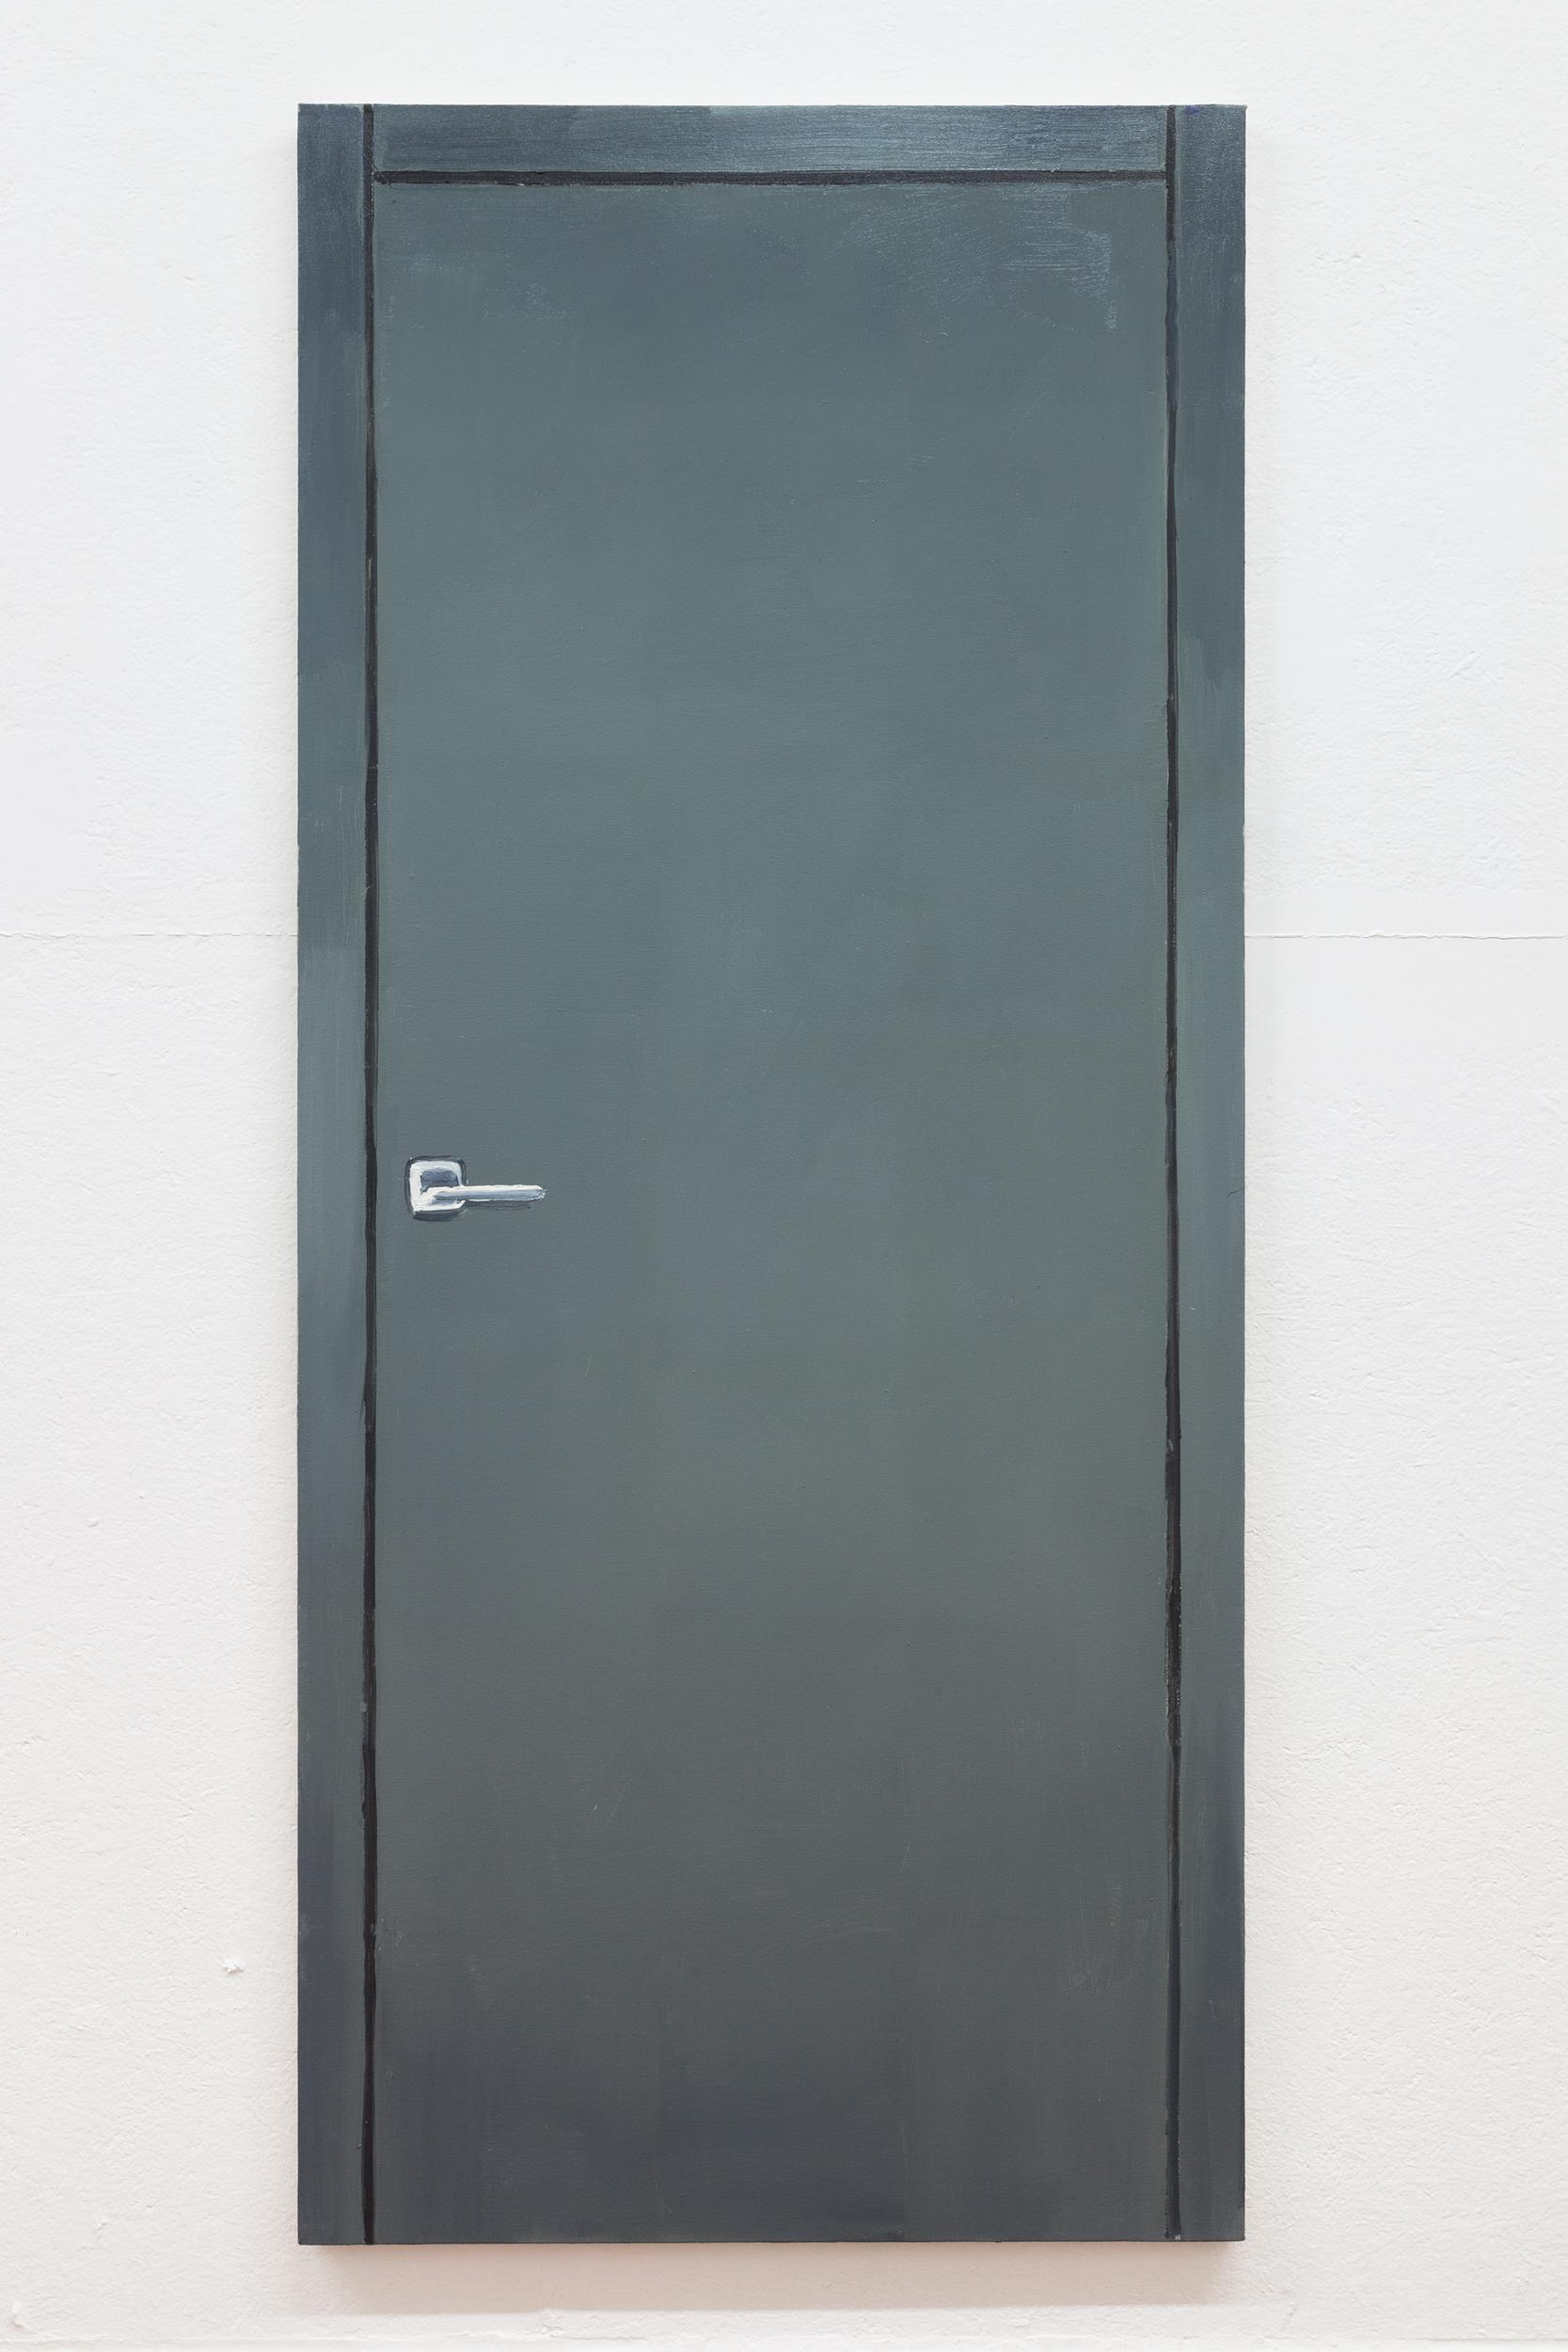 Richard Bosman,  Ad Reinhardt Door , 2016, Oil on canvas, 72 x 32 inches